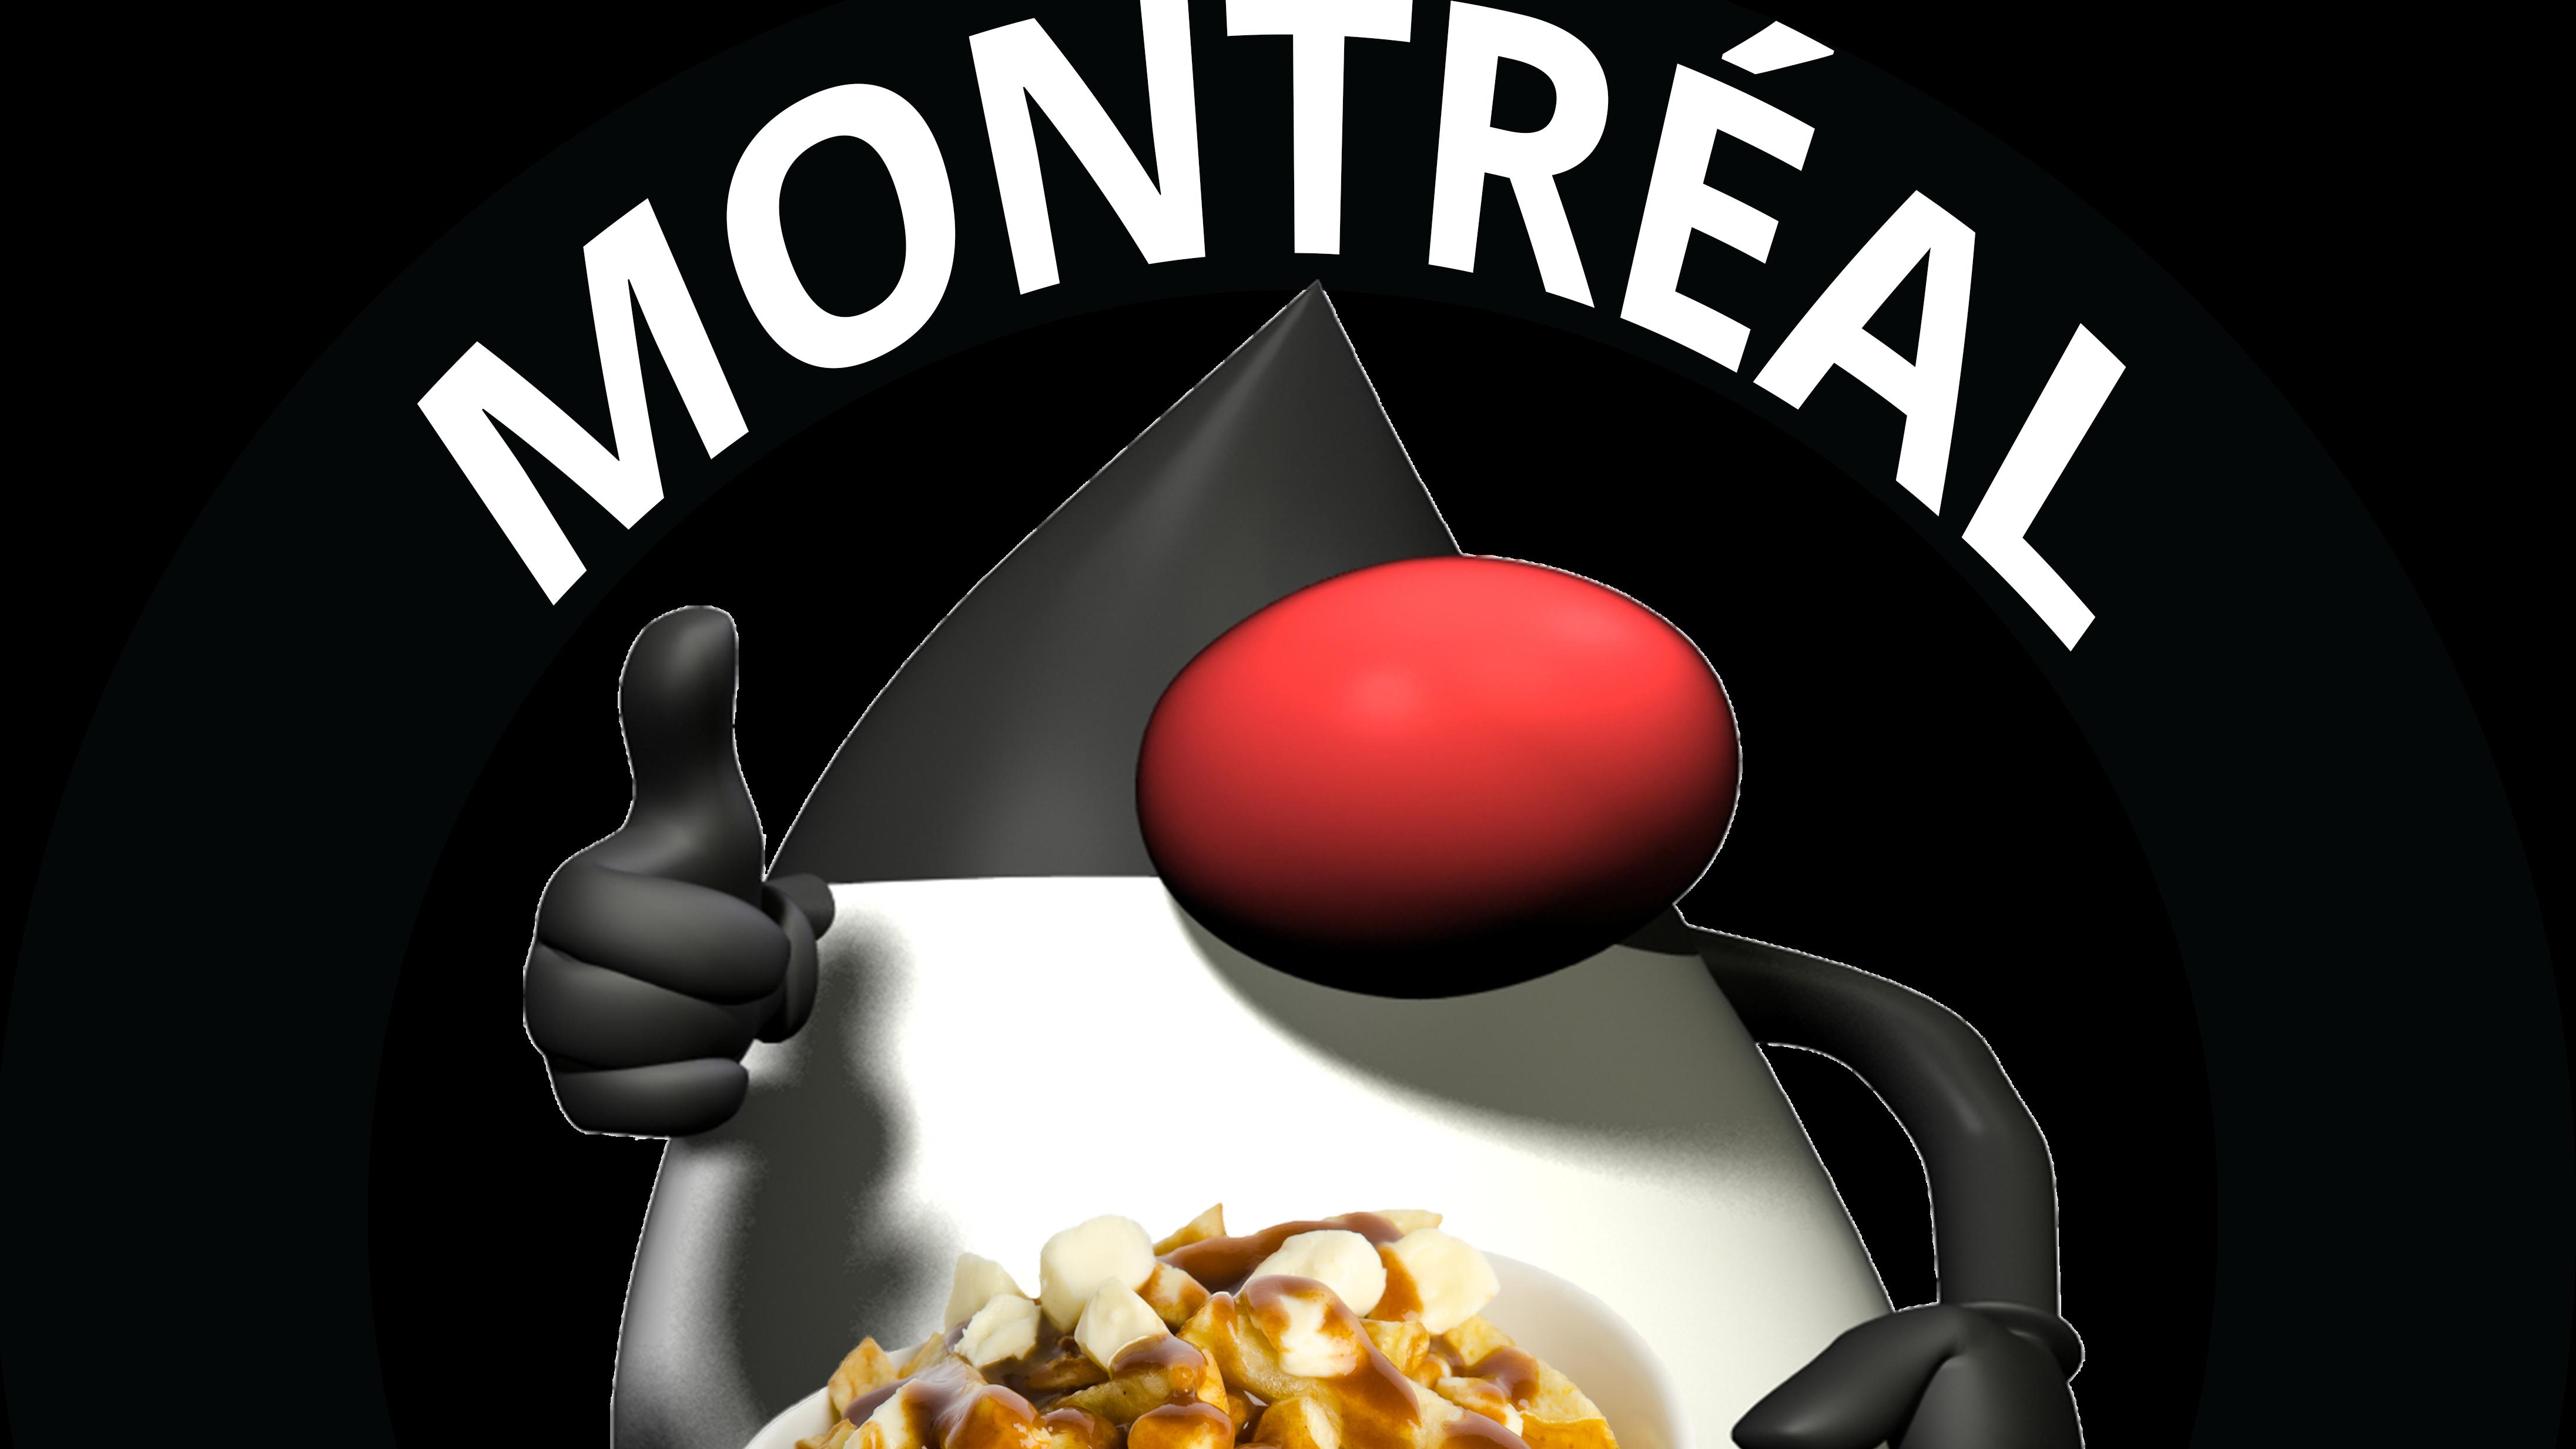 Montréal JUG